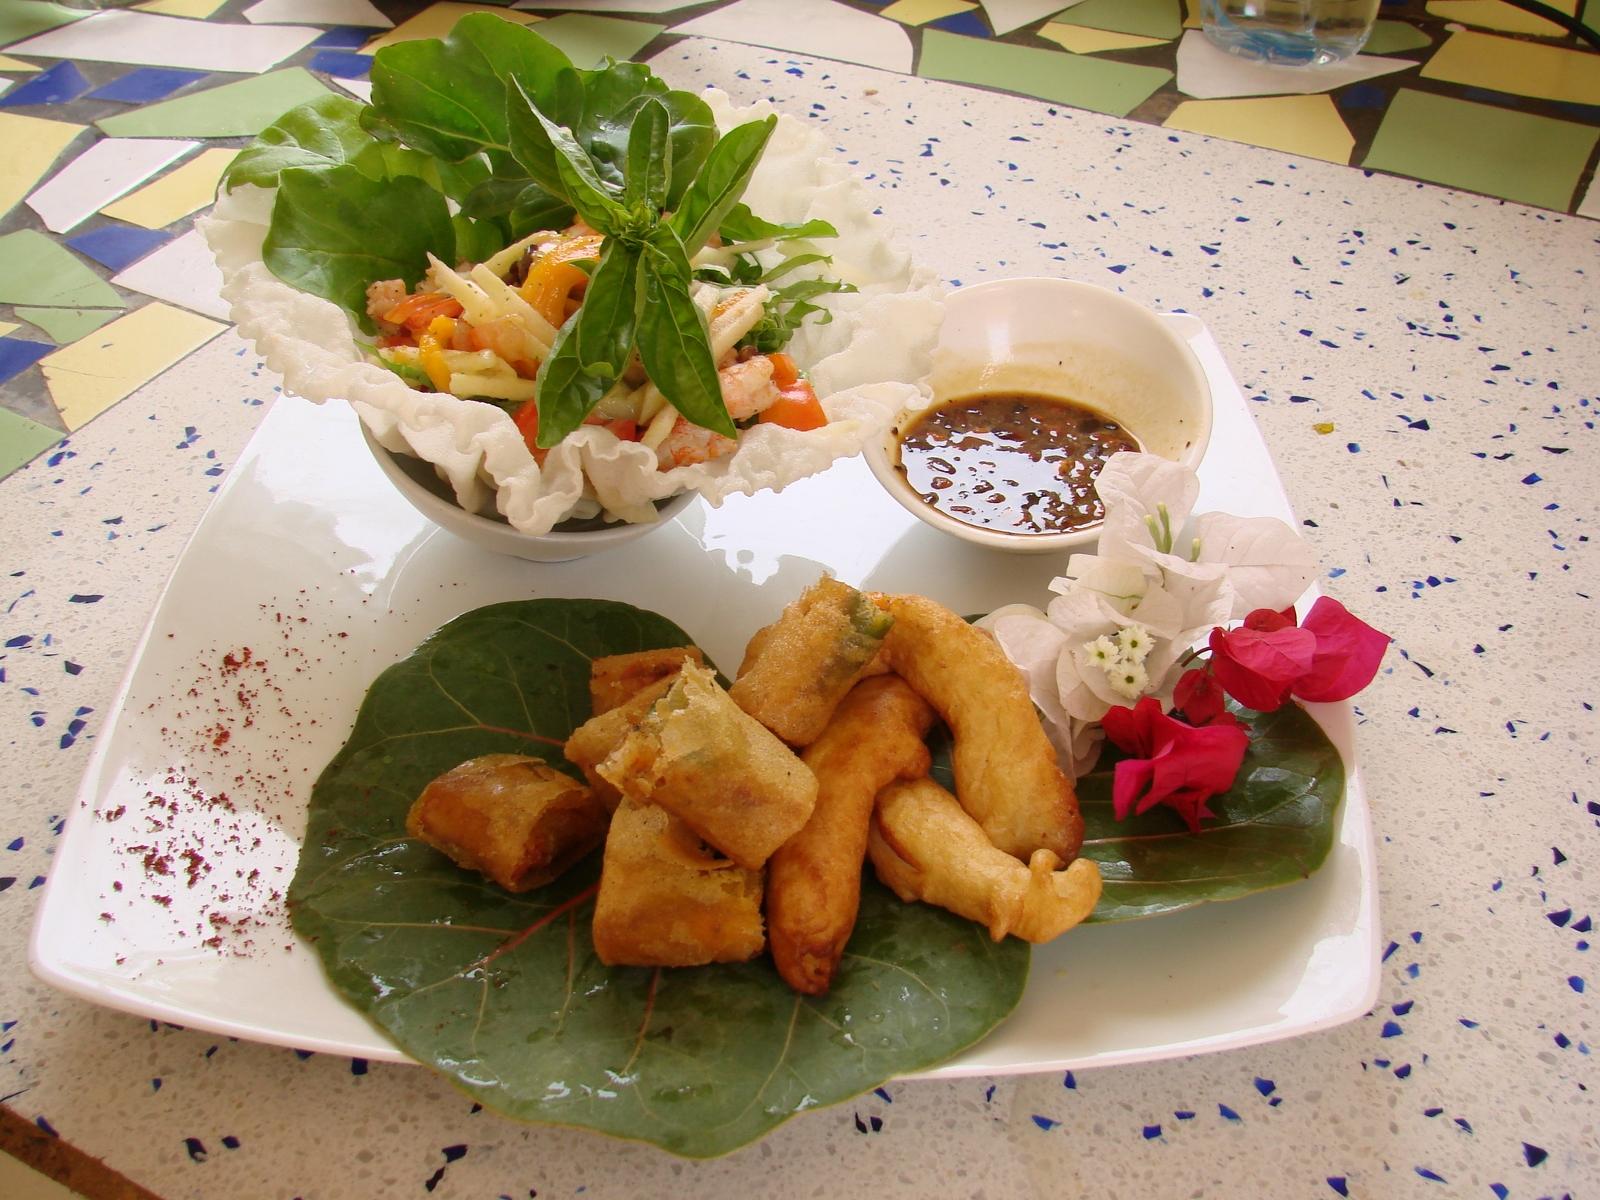 Niassam_lodge_restaurant (4)fraicheur